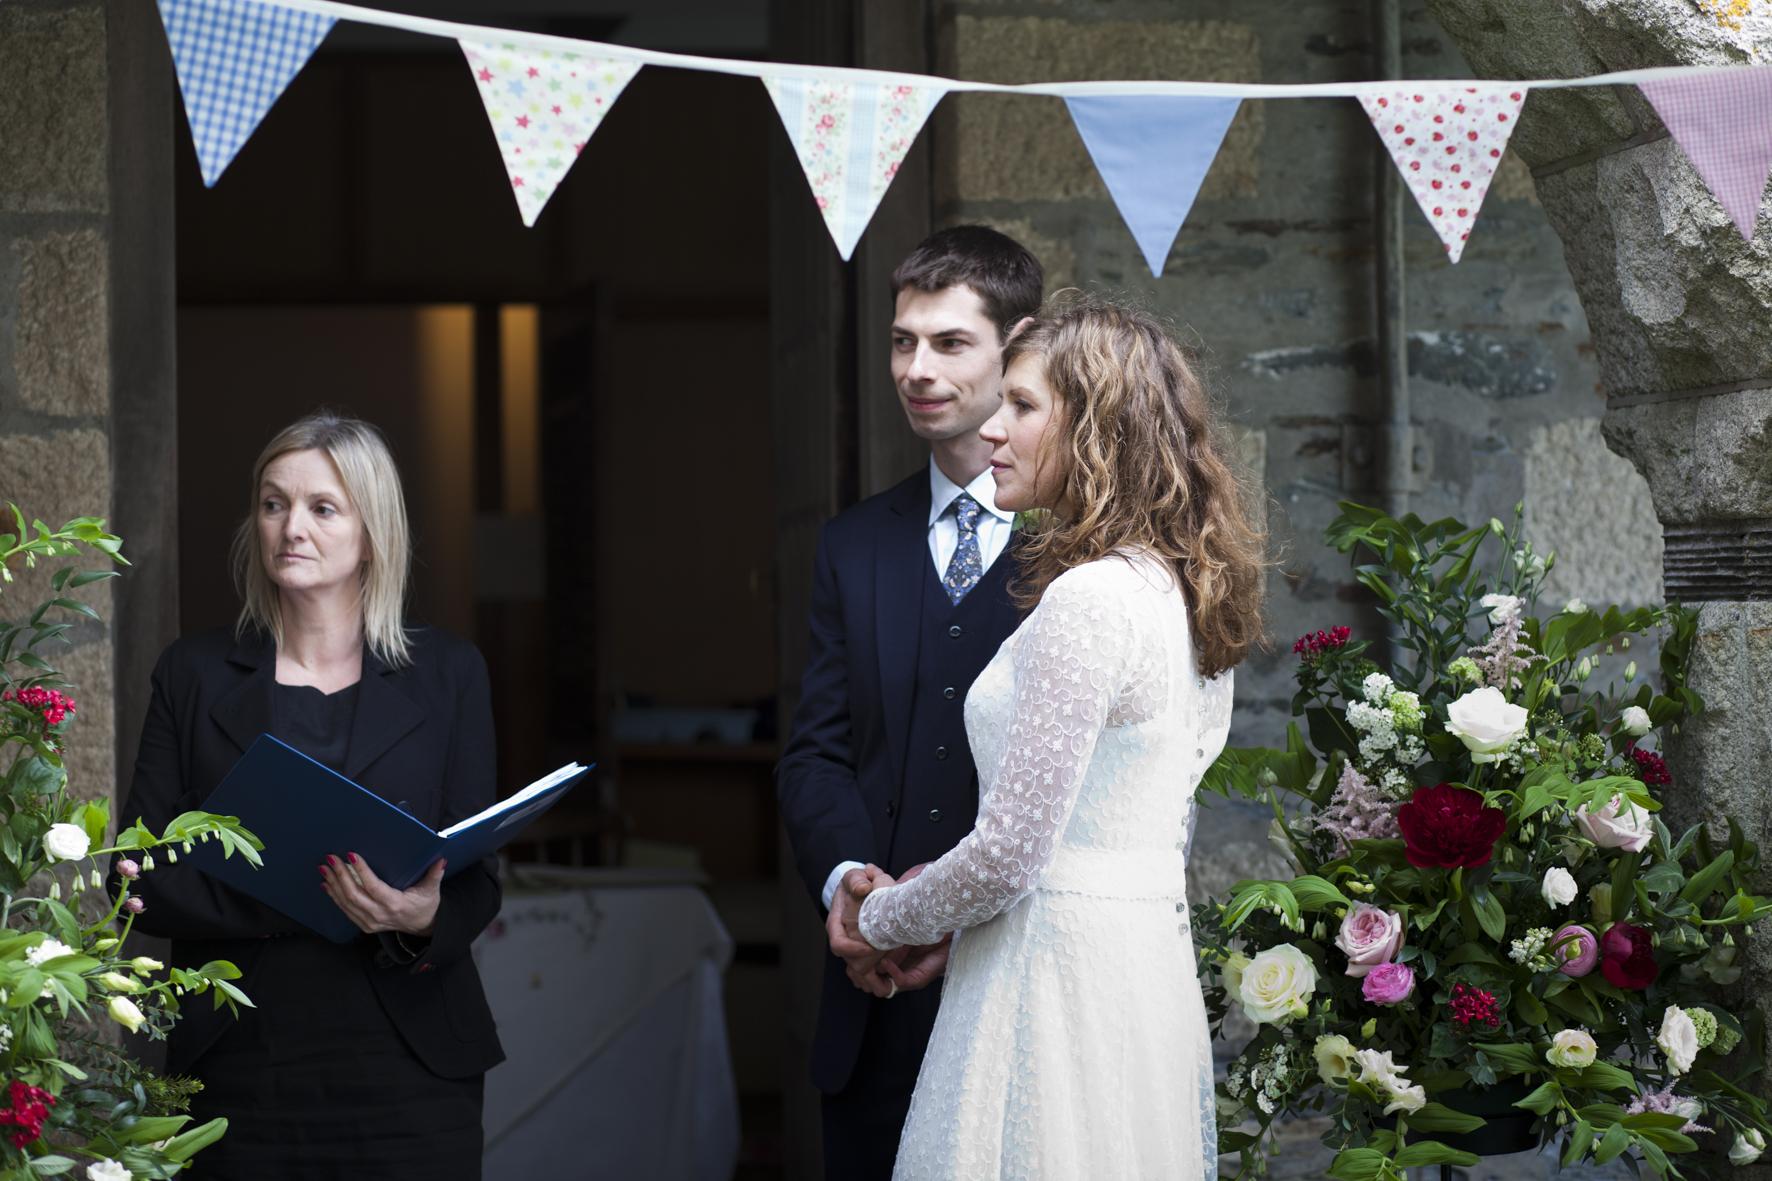 Wedding example_M&P__MG_3391_Claudia Leisinger.jpg